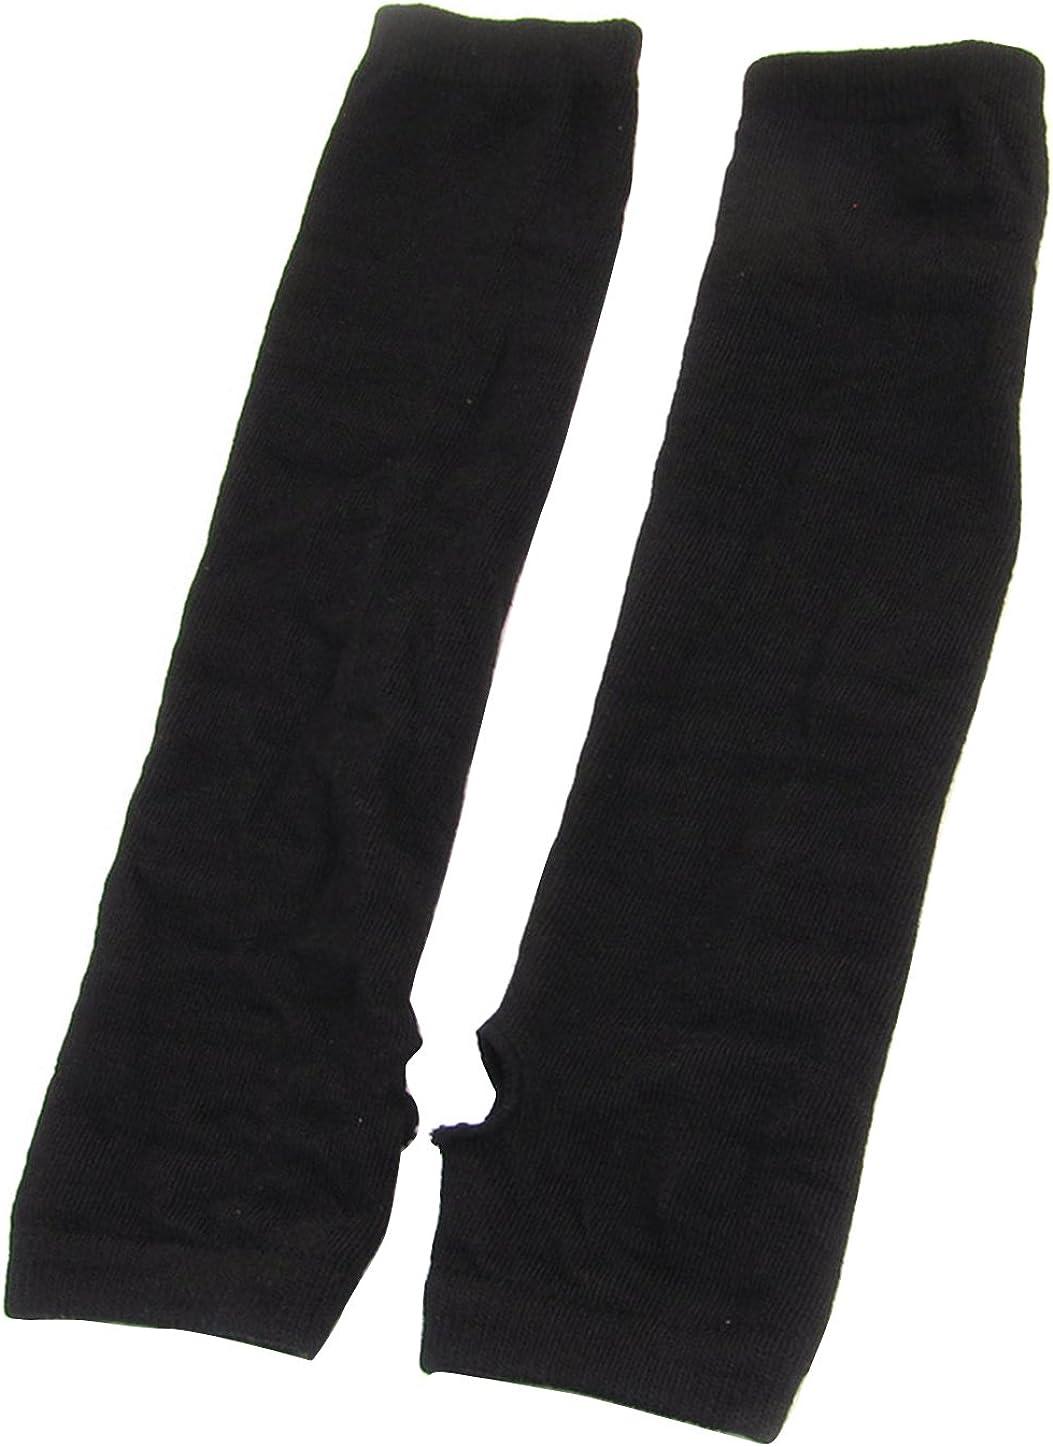 Allegra K Black Knitted Fingerless Long Gloves Arm Warmers Pair for Lady